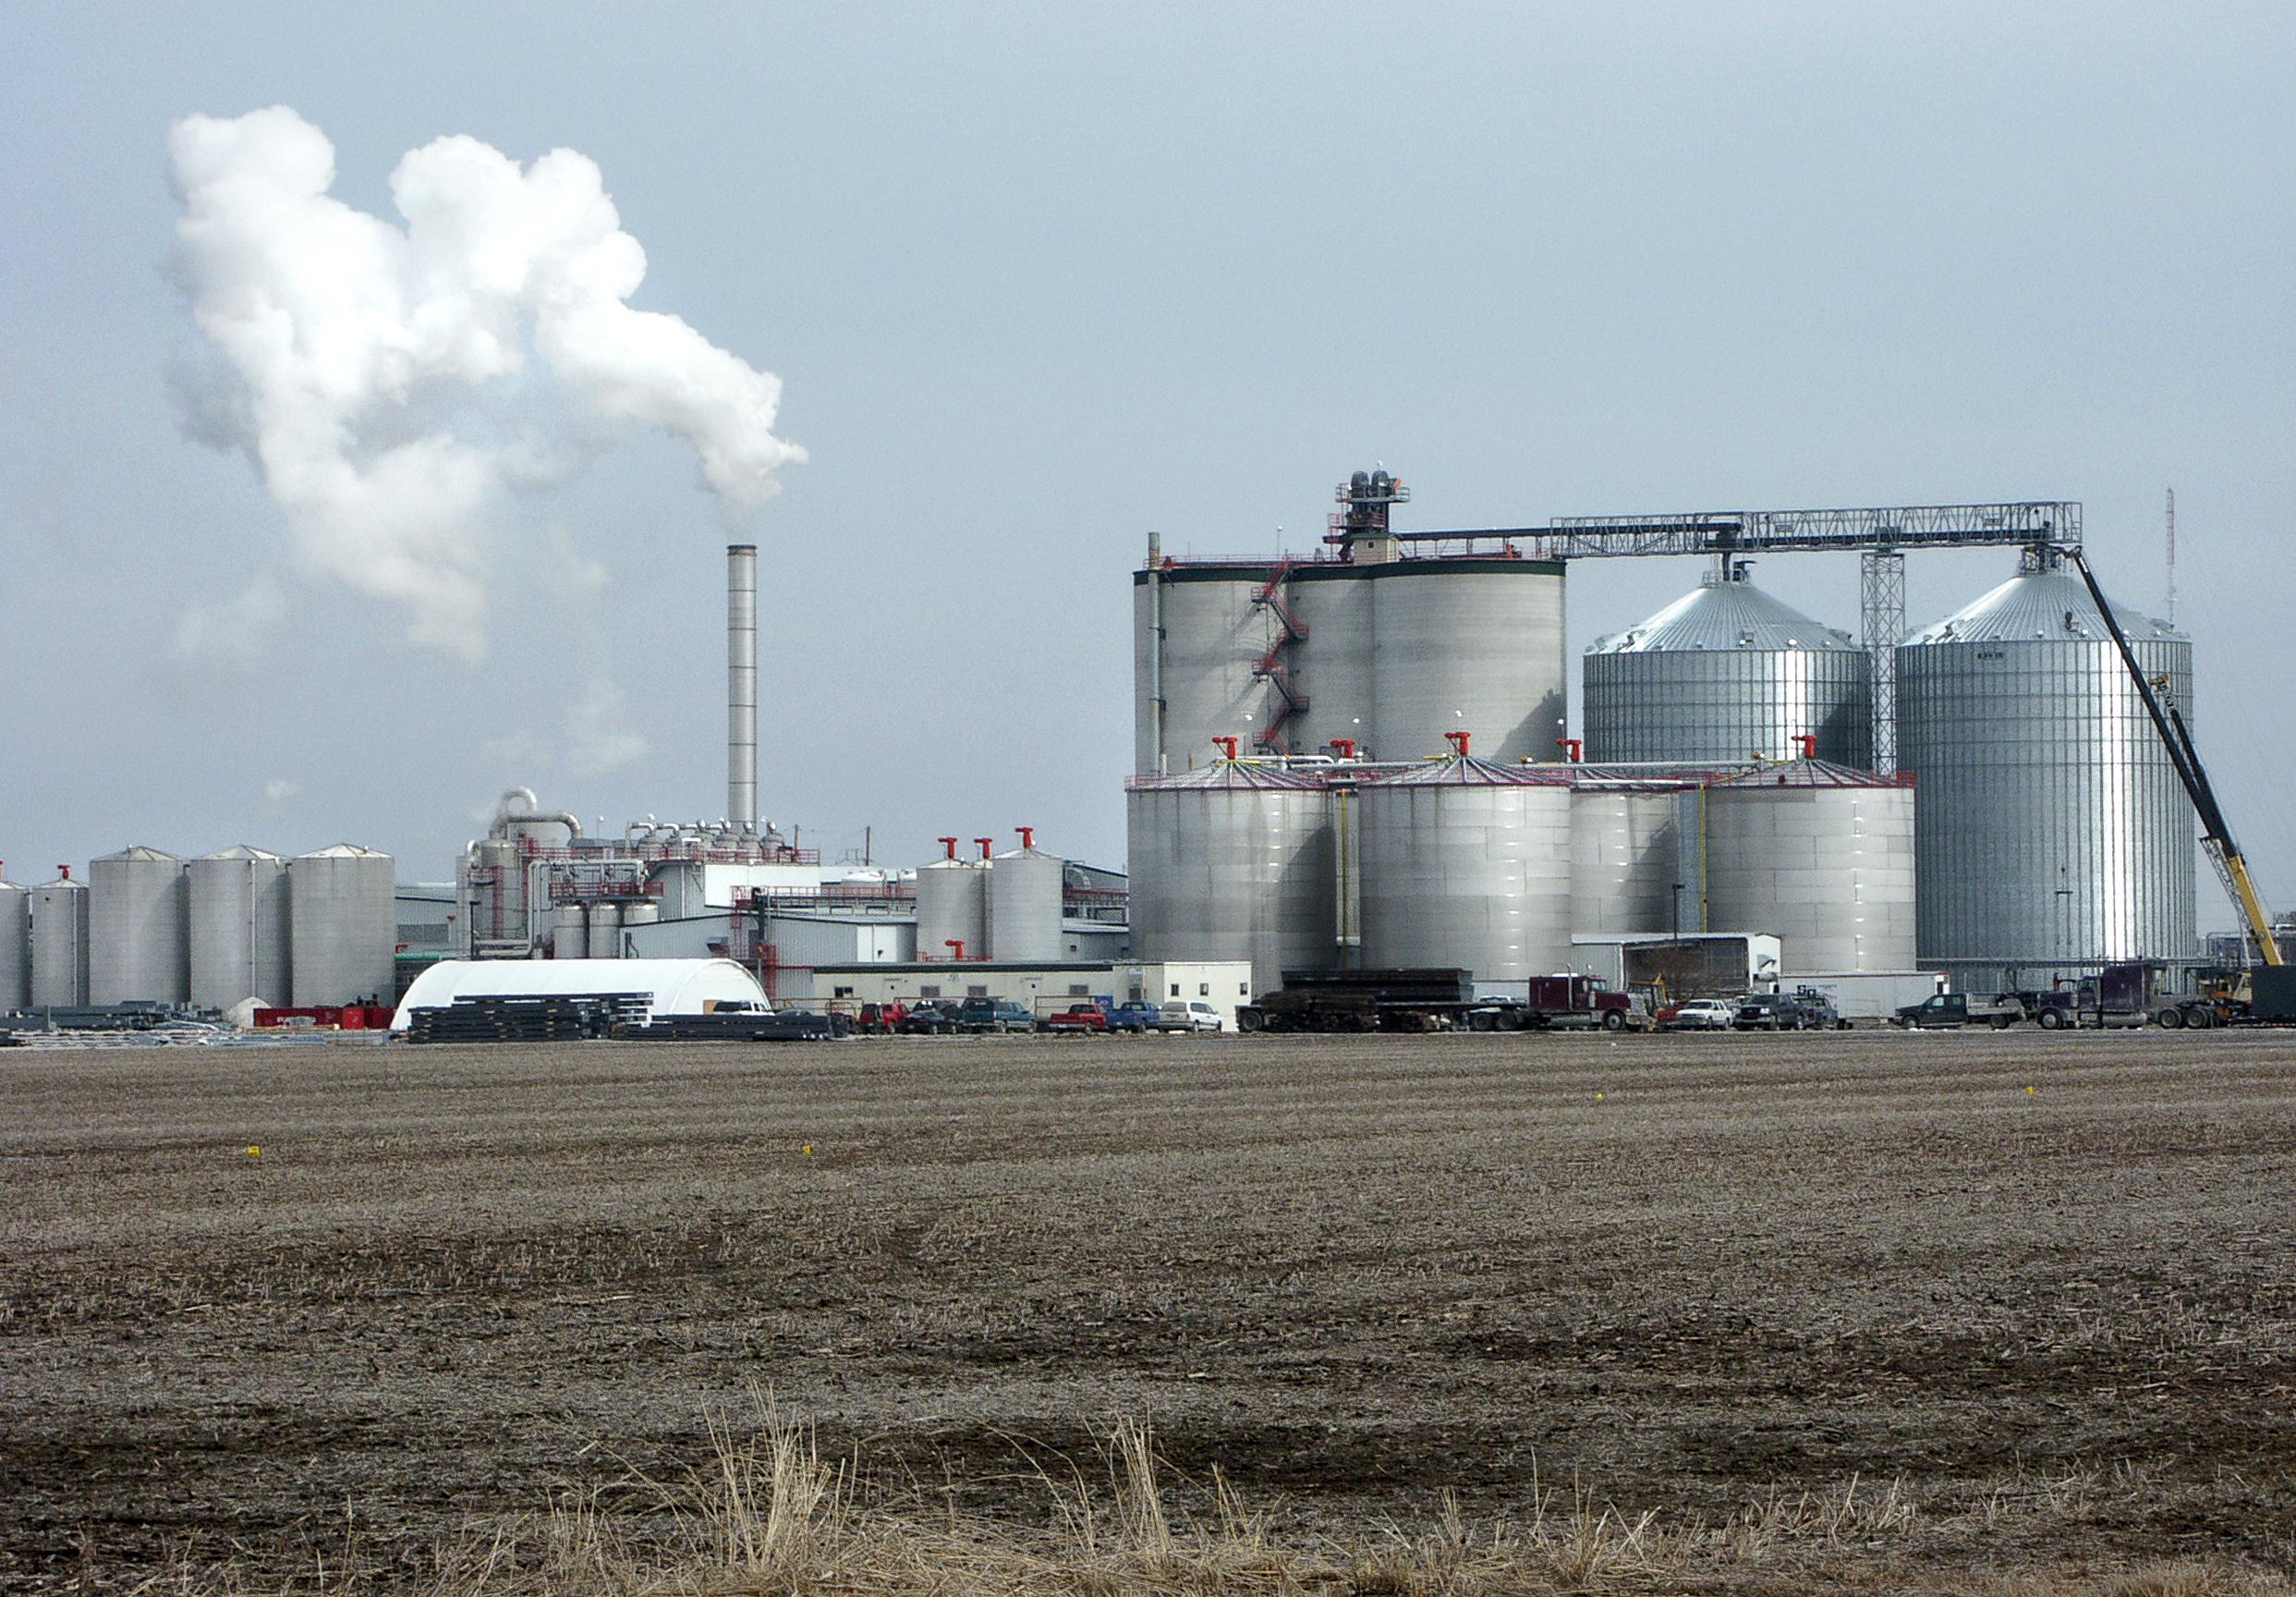 https://i0.wp.com/upload.wikimedia.org/wikipedia/commons/3/35/Ethanol_plant.jpg